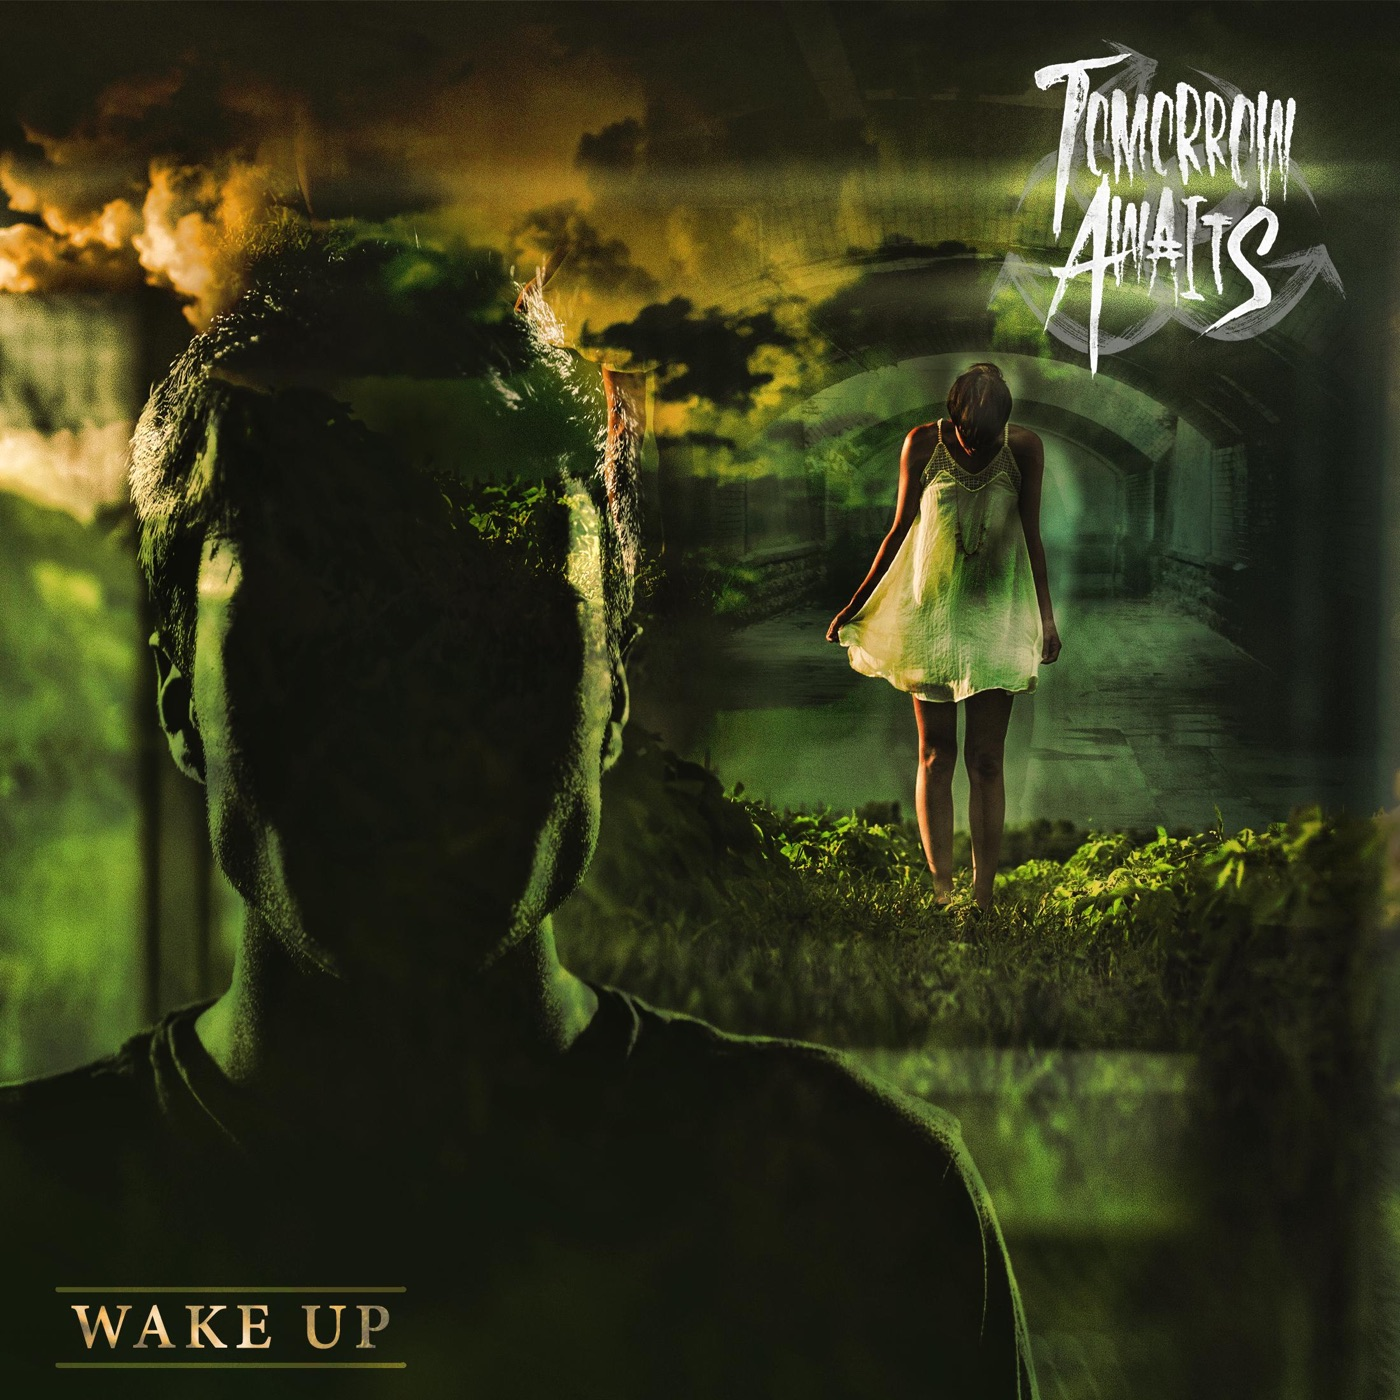 Tomorrow Awaits - Wake Up [single] (2017)